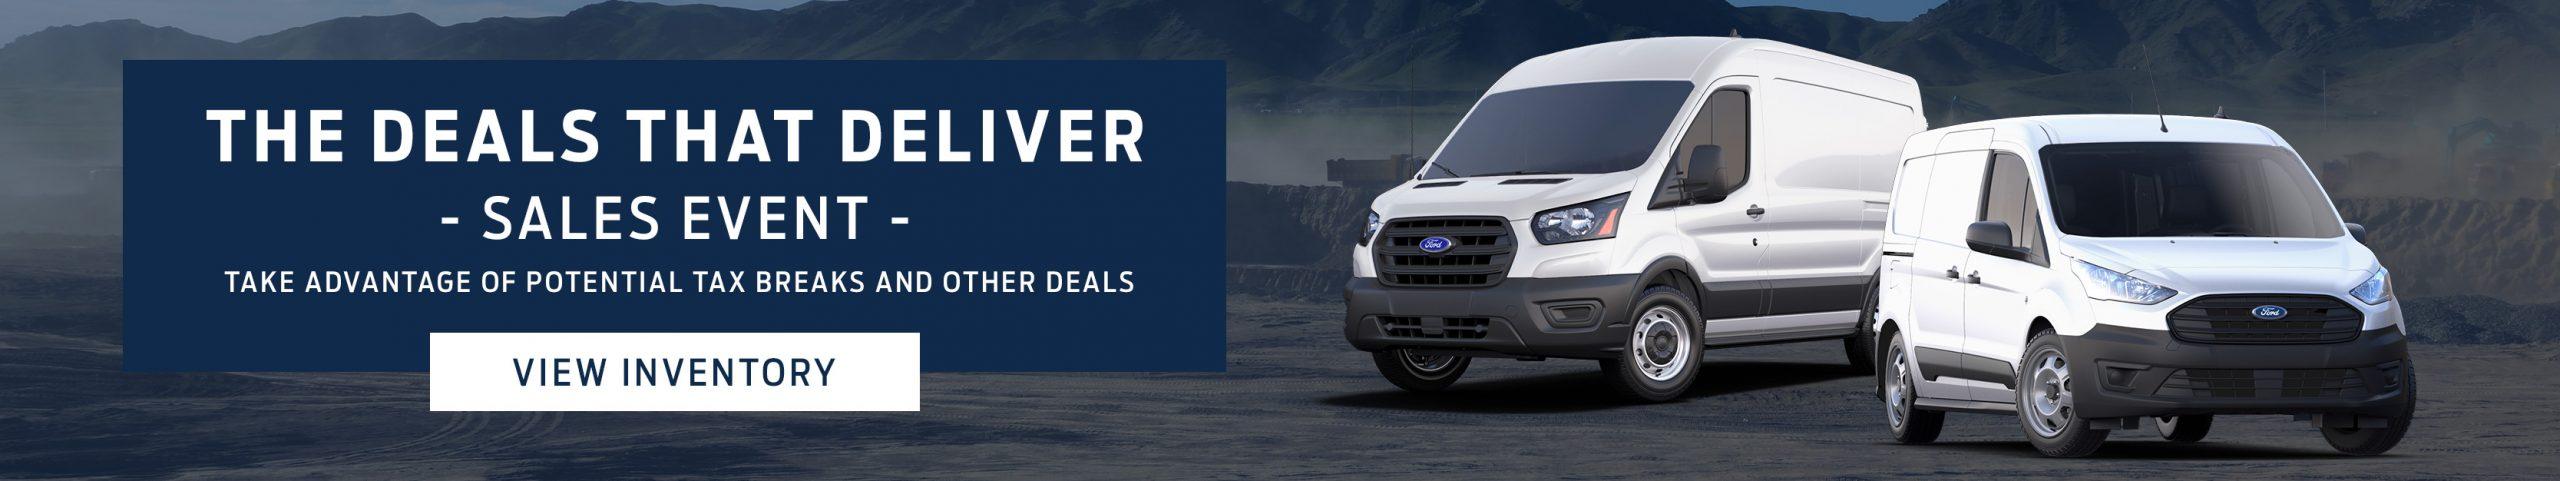 Deals That Deliver Event Srp